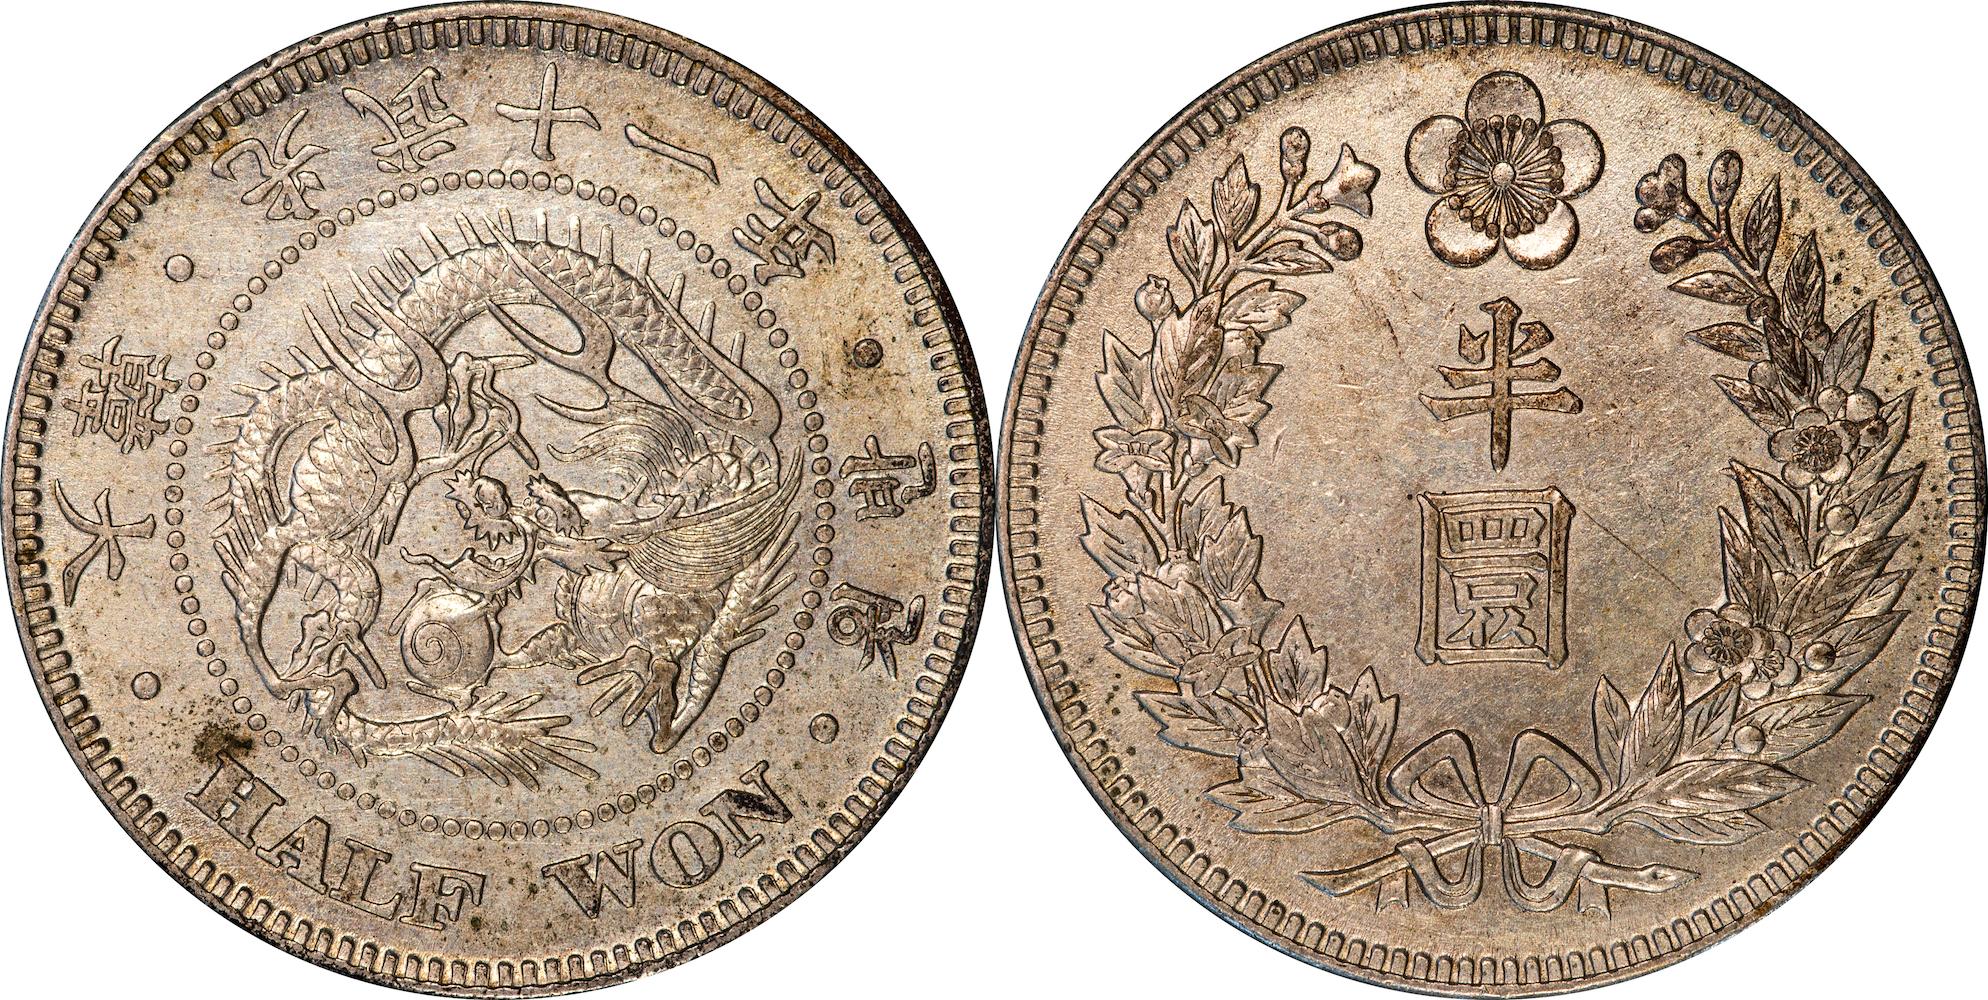 Korea (Japanese Protectorate) - 1907 Half Won